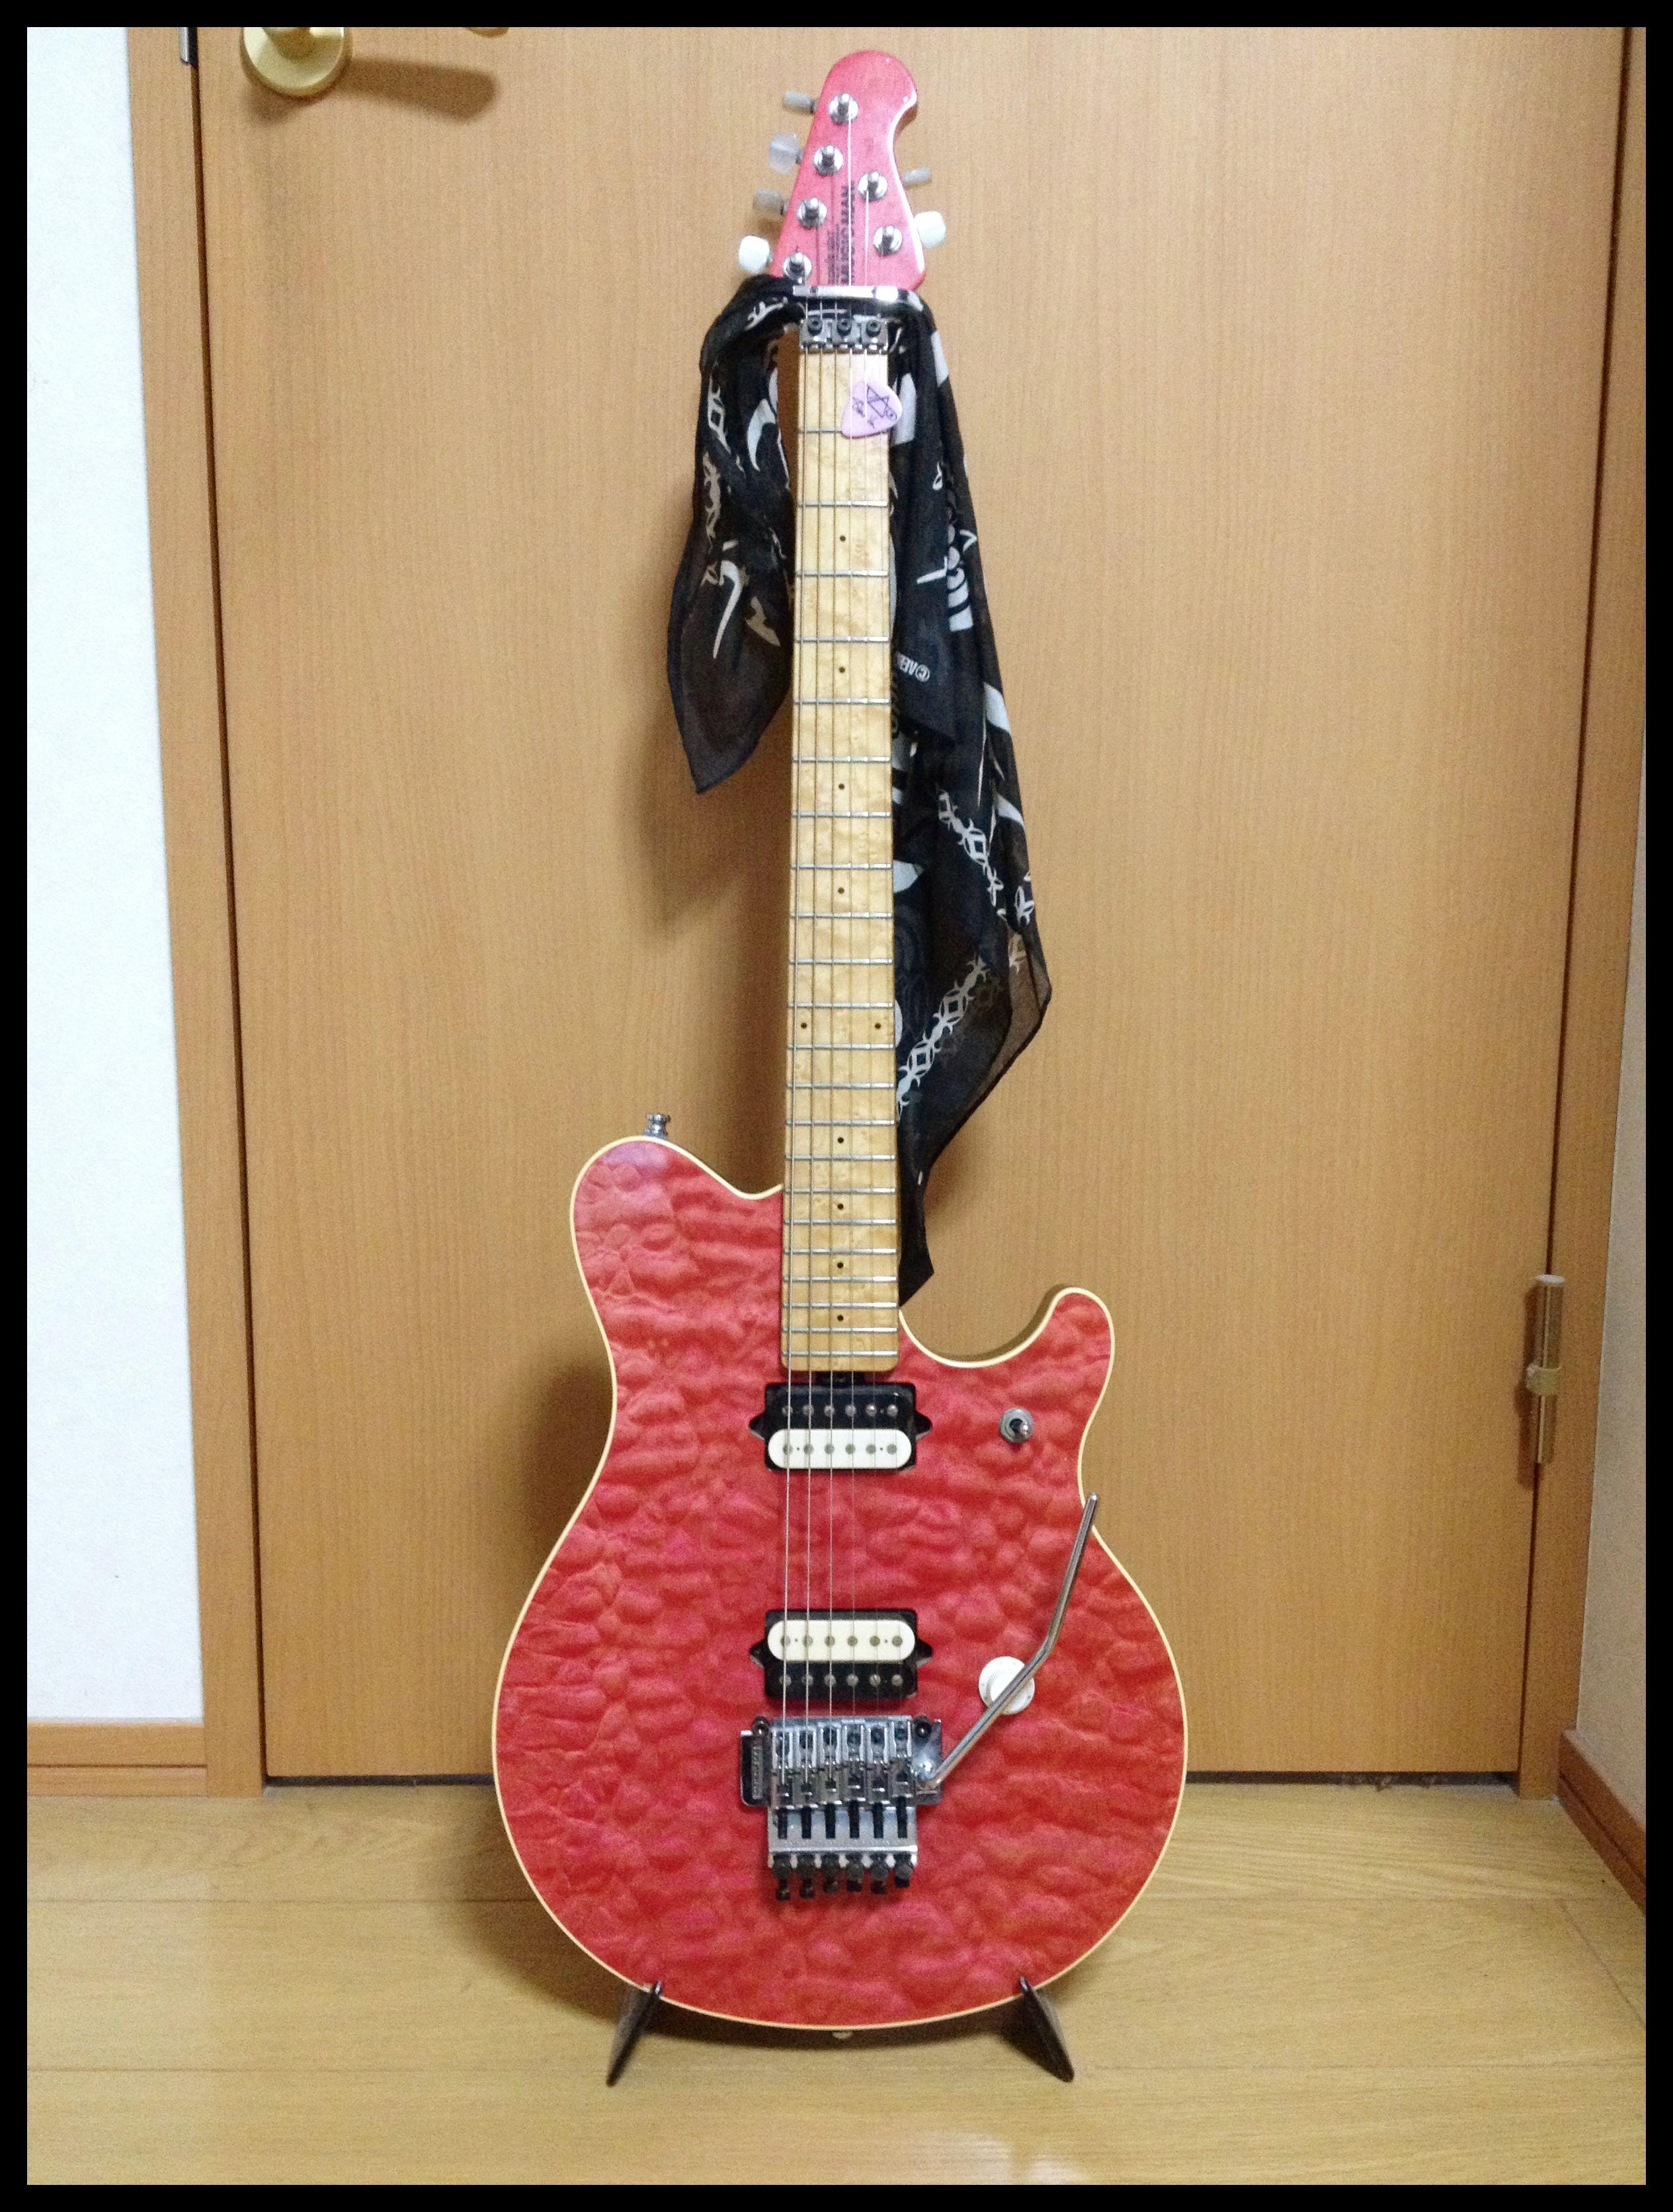 Music Man Evh Wolfgang Wiring Diagram Electrical Diagrams Pickup Musicman Axis Ex Pink Guitars Pinterest Guitar Famous